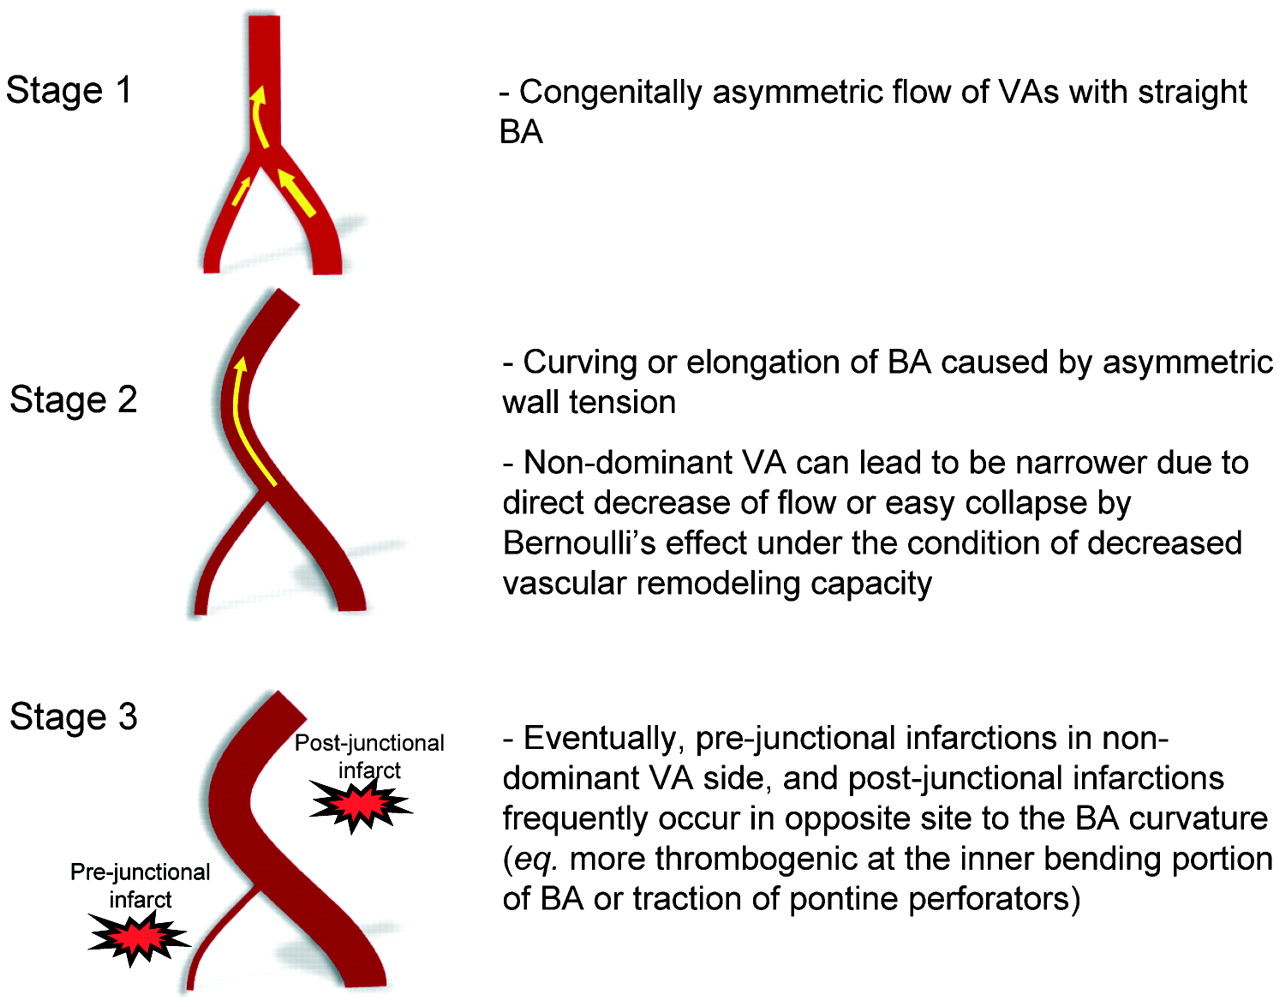 Vertebral artery dominance contributes to basilar artery curvature ...